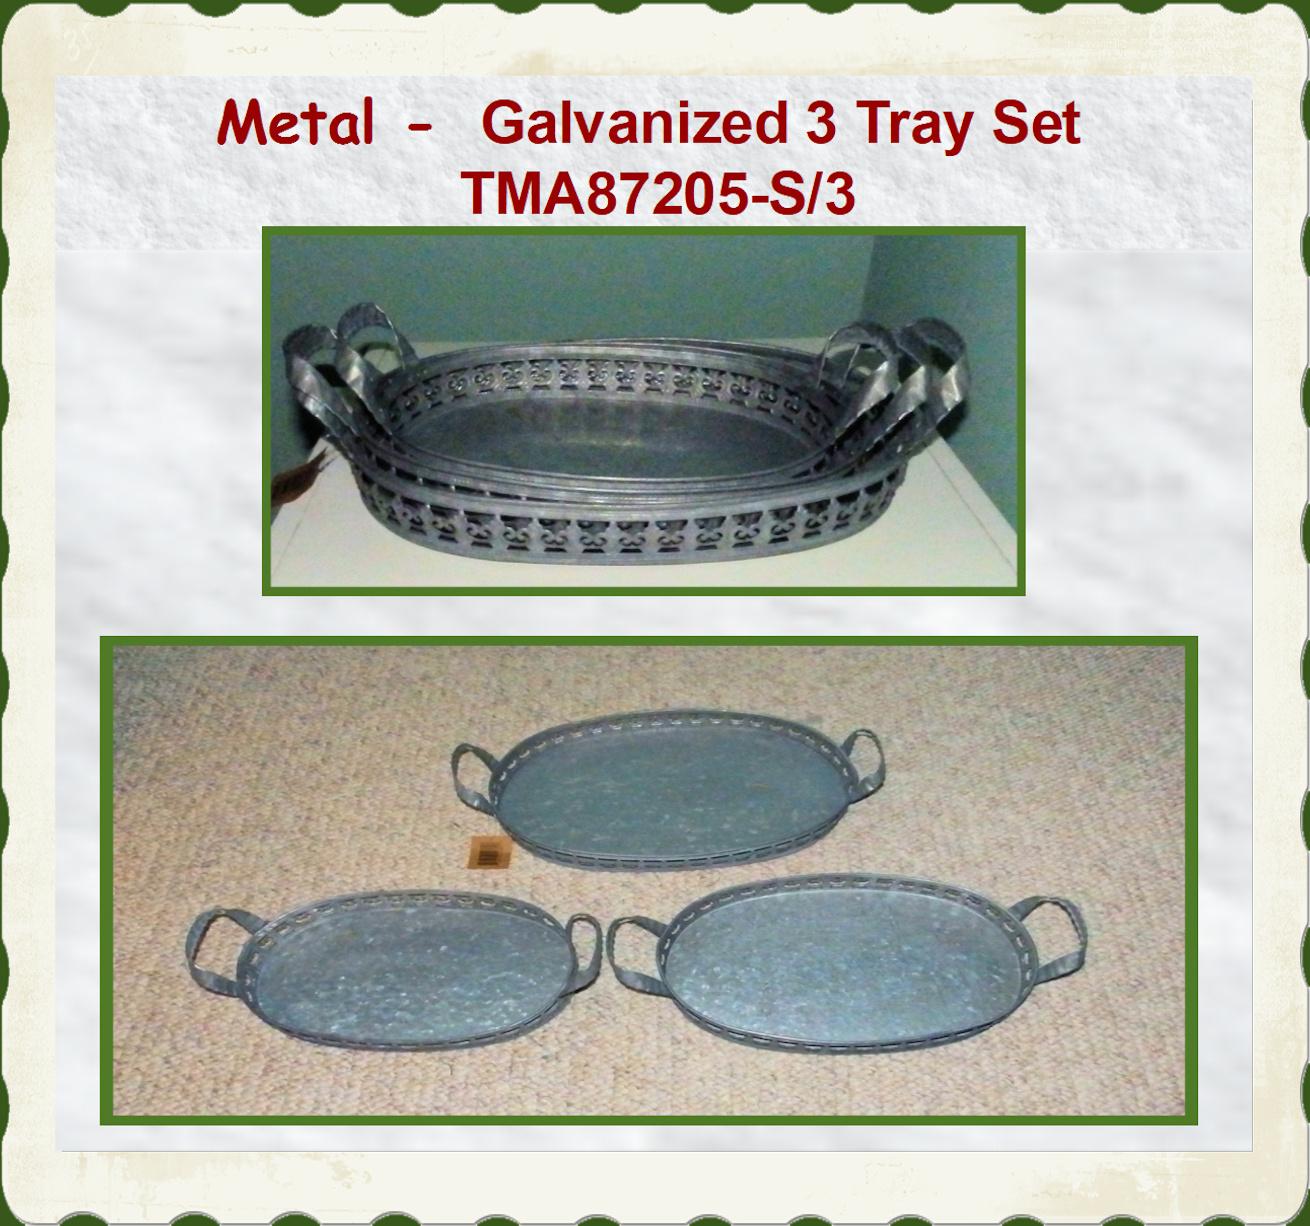 metal-3-tray-set-tma87205-s3-1-collage.jpg